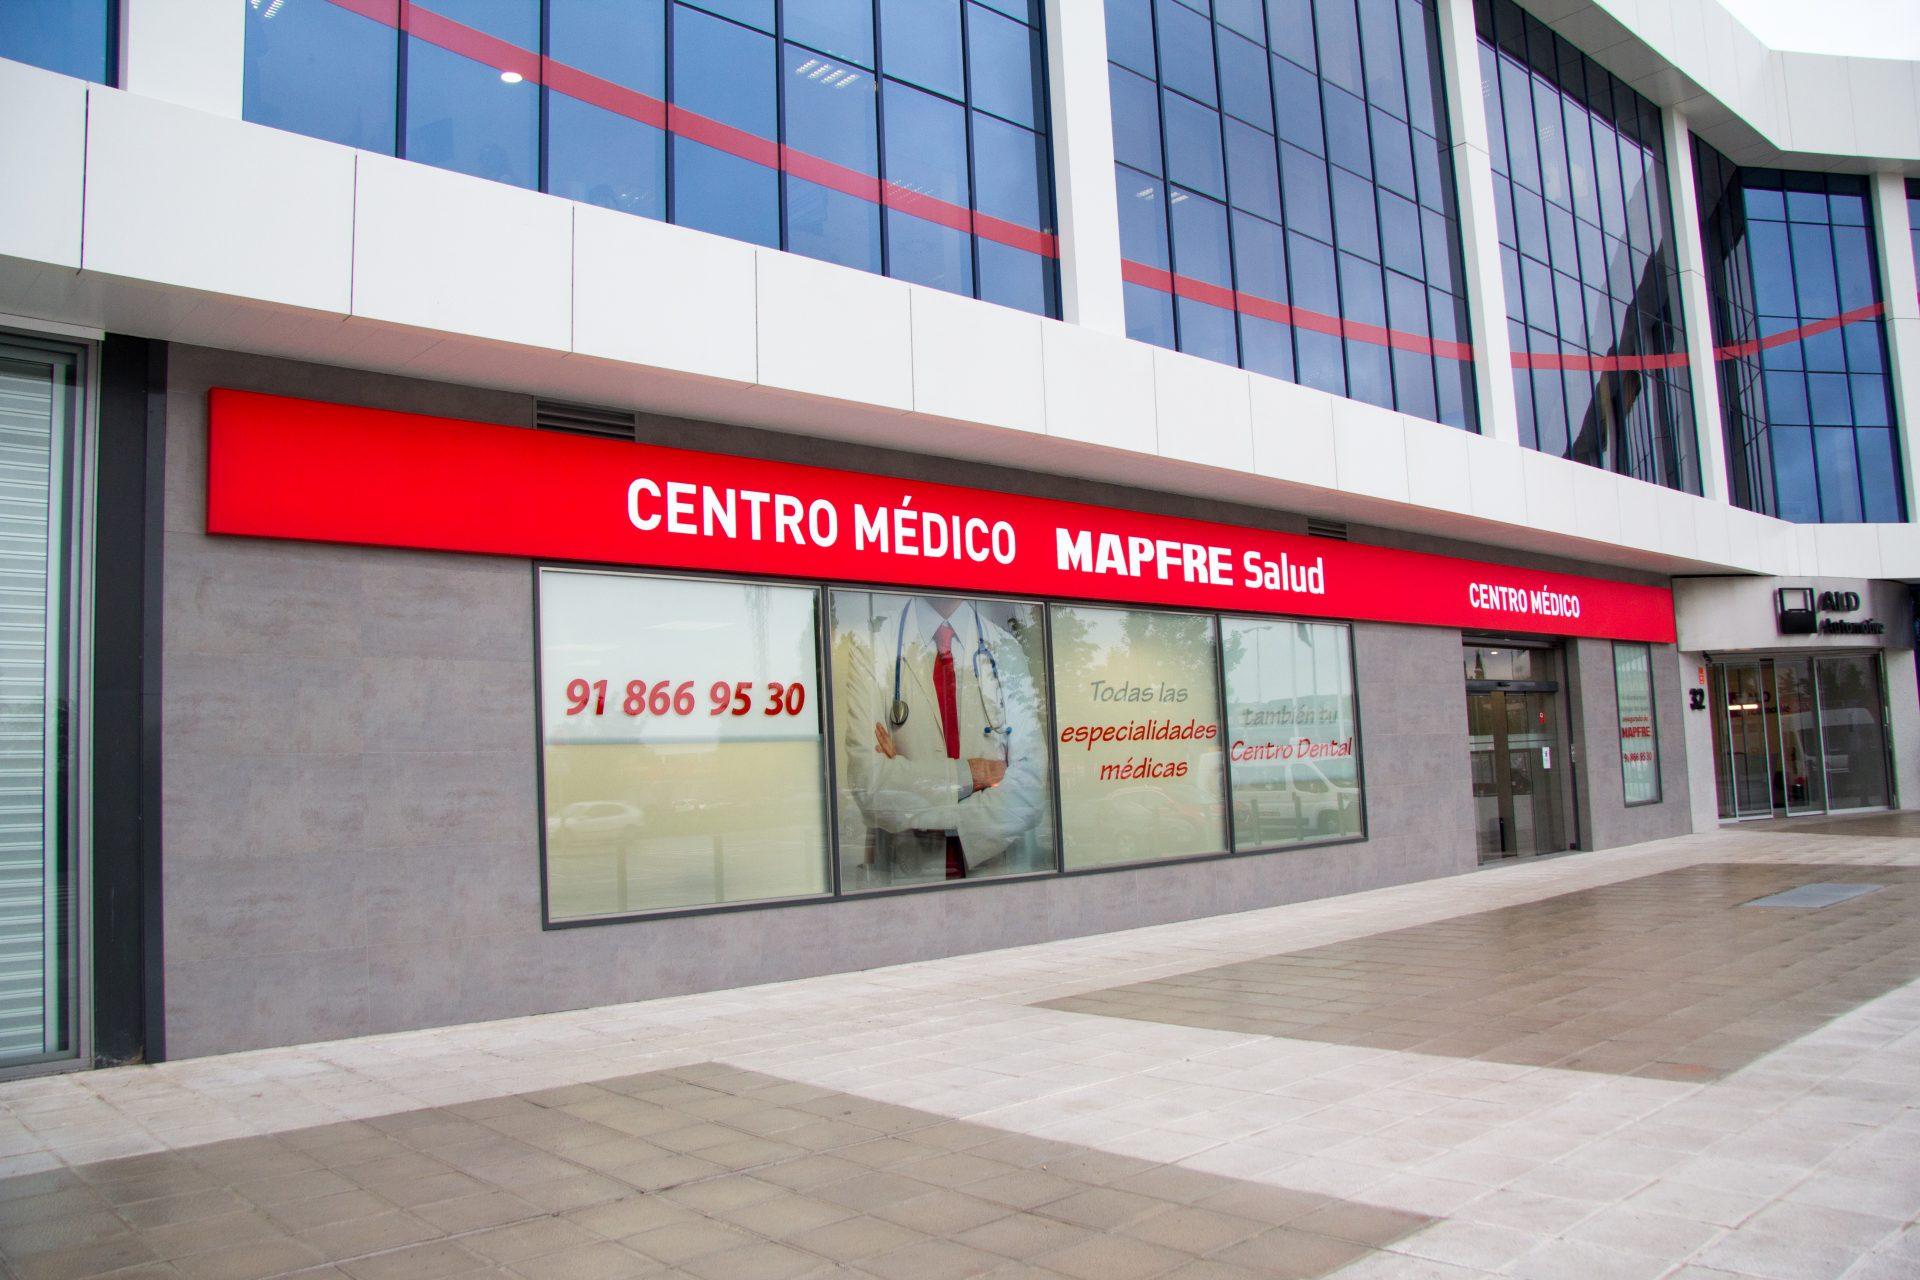 Fachada Centro Médico Mapfre Salud